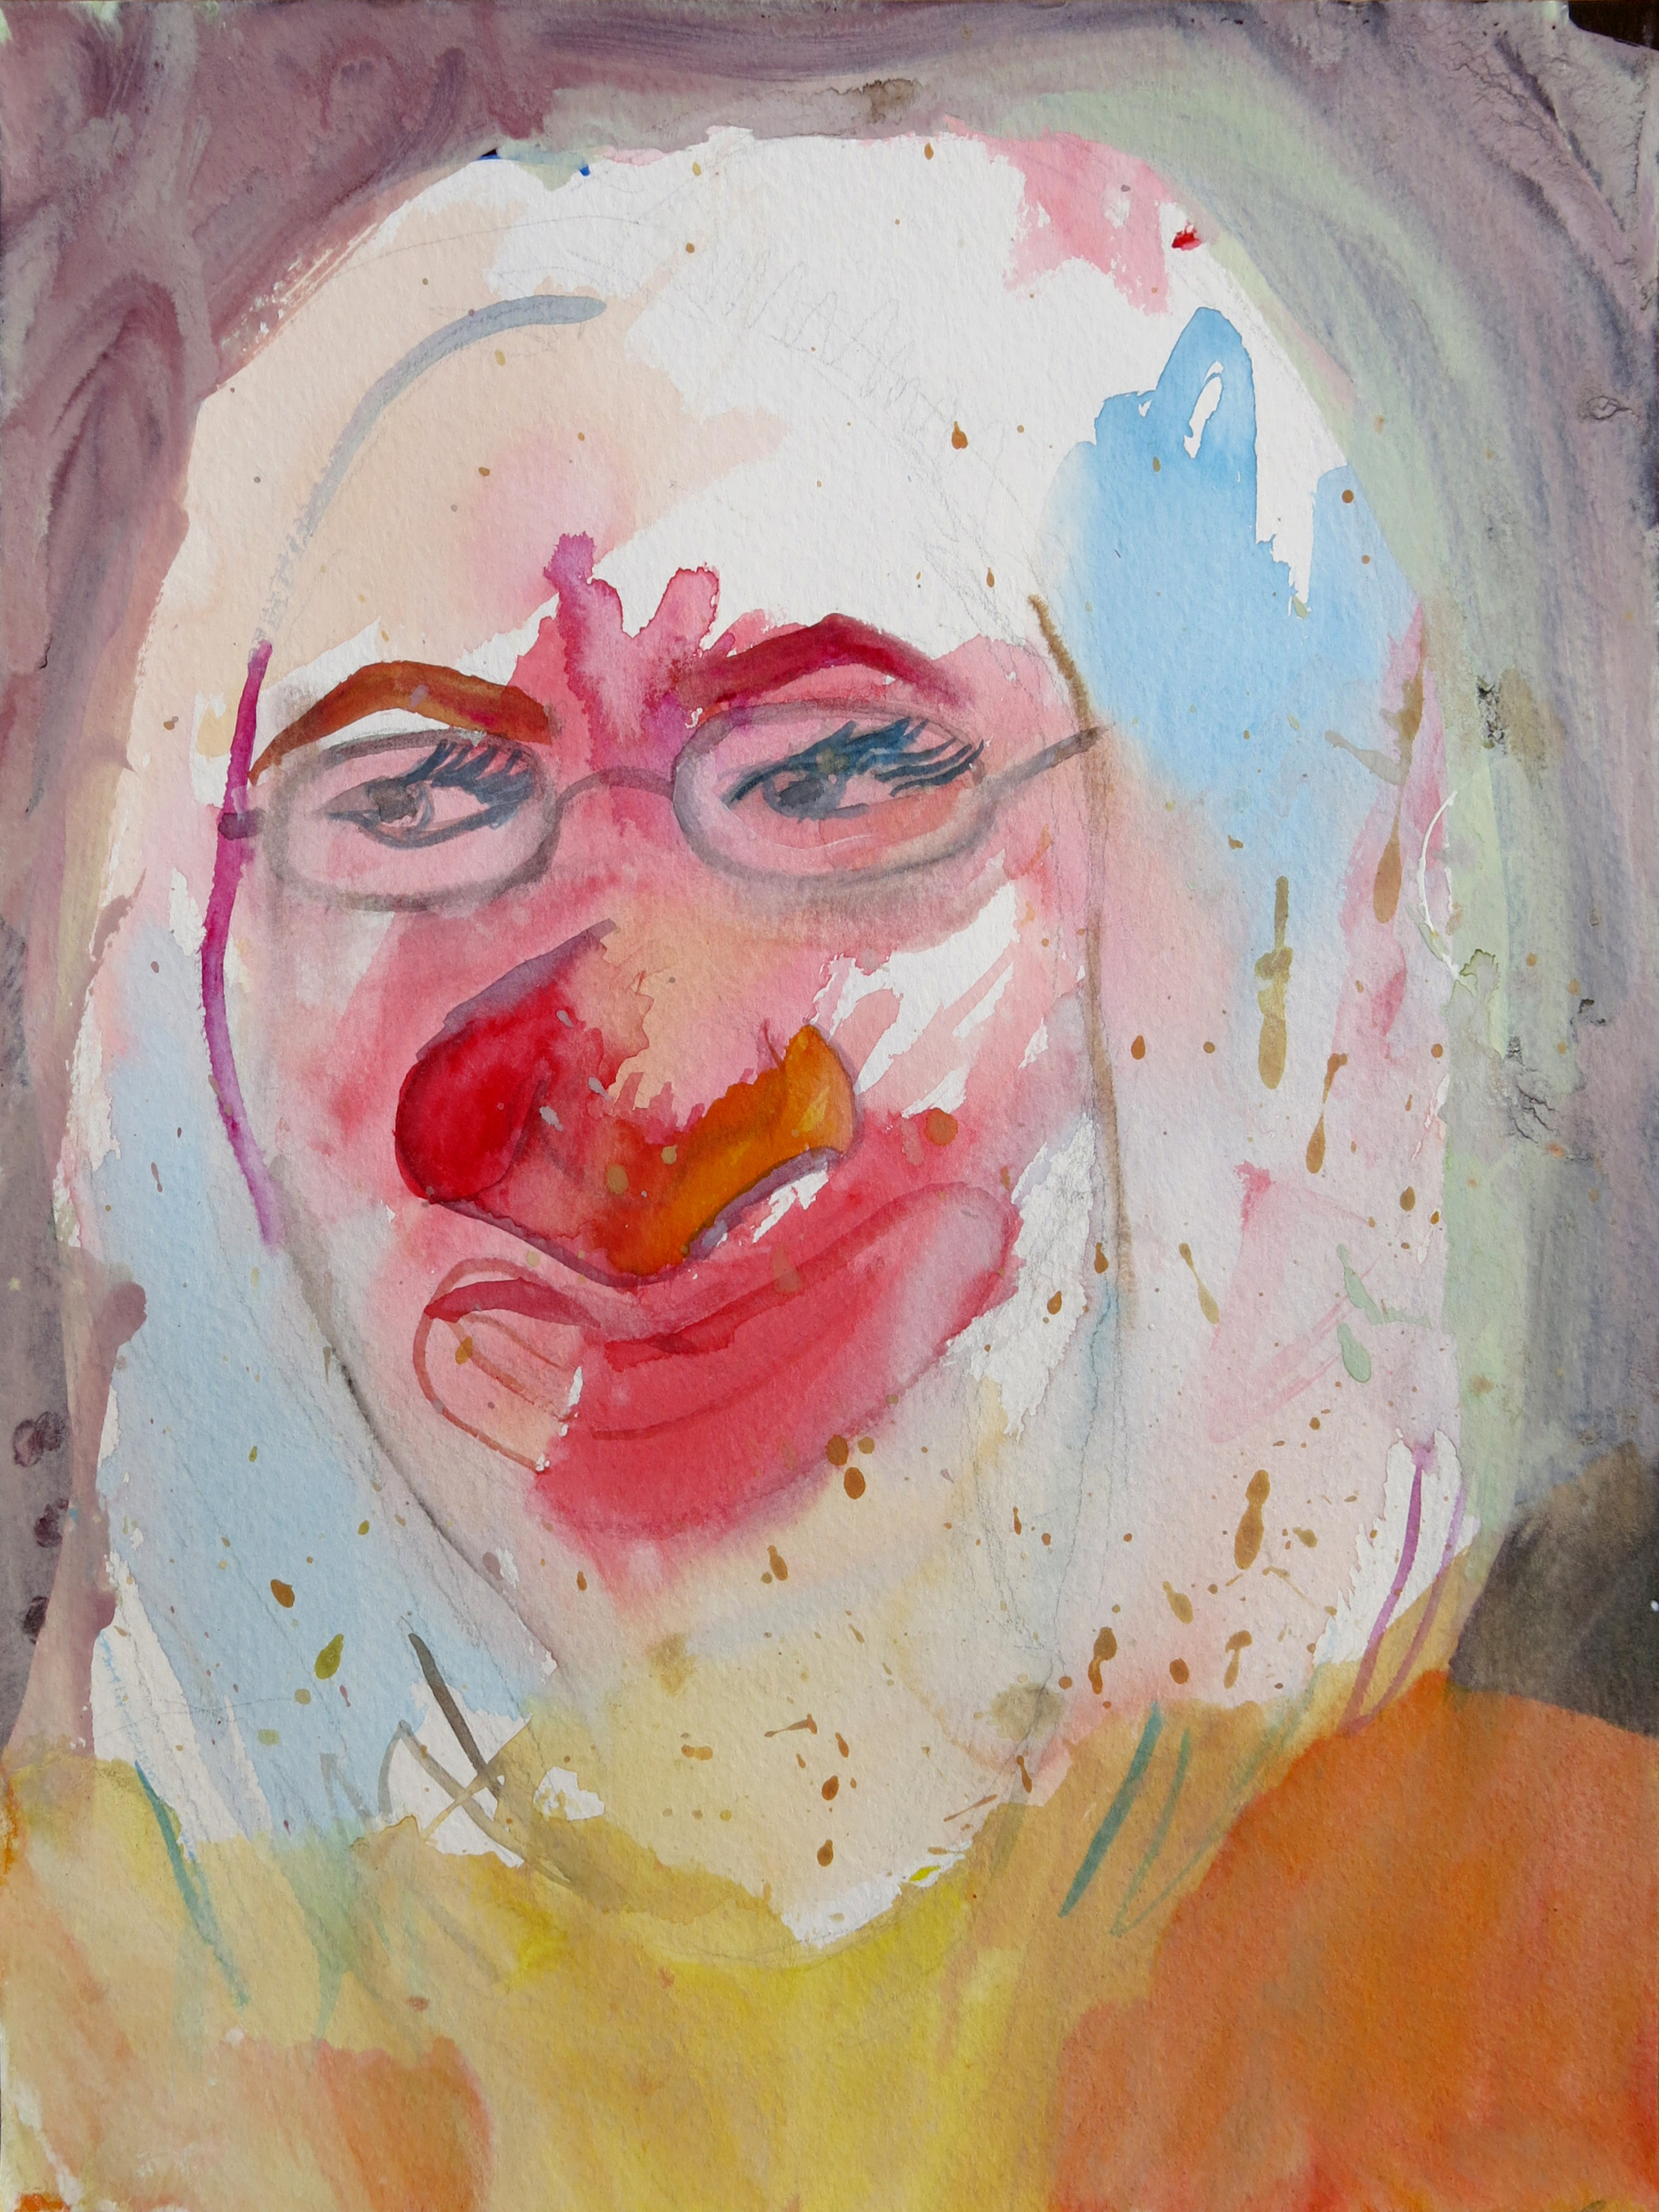 Barbra Streisand Portrait #38